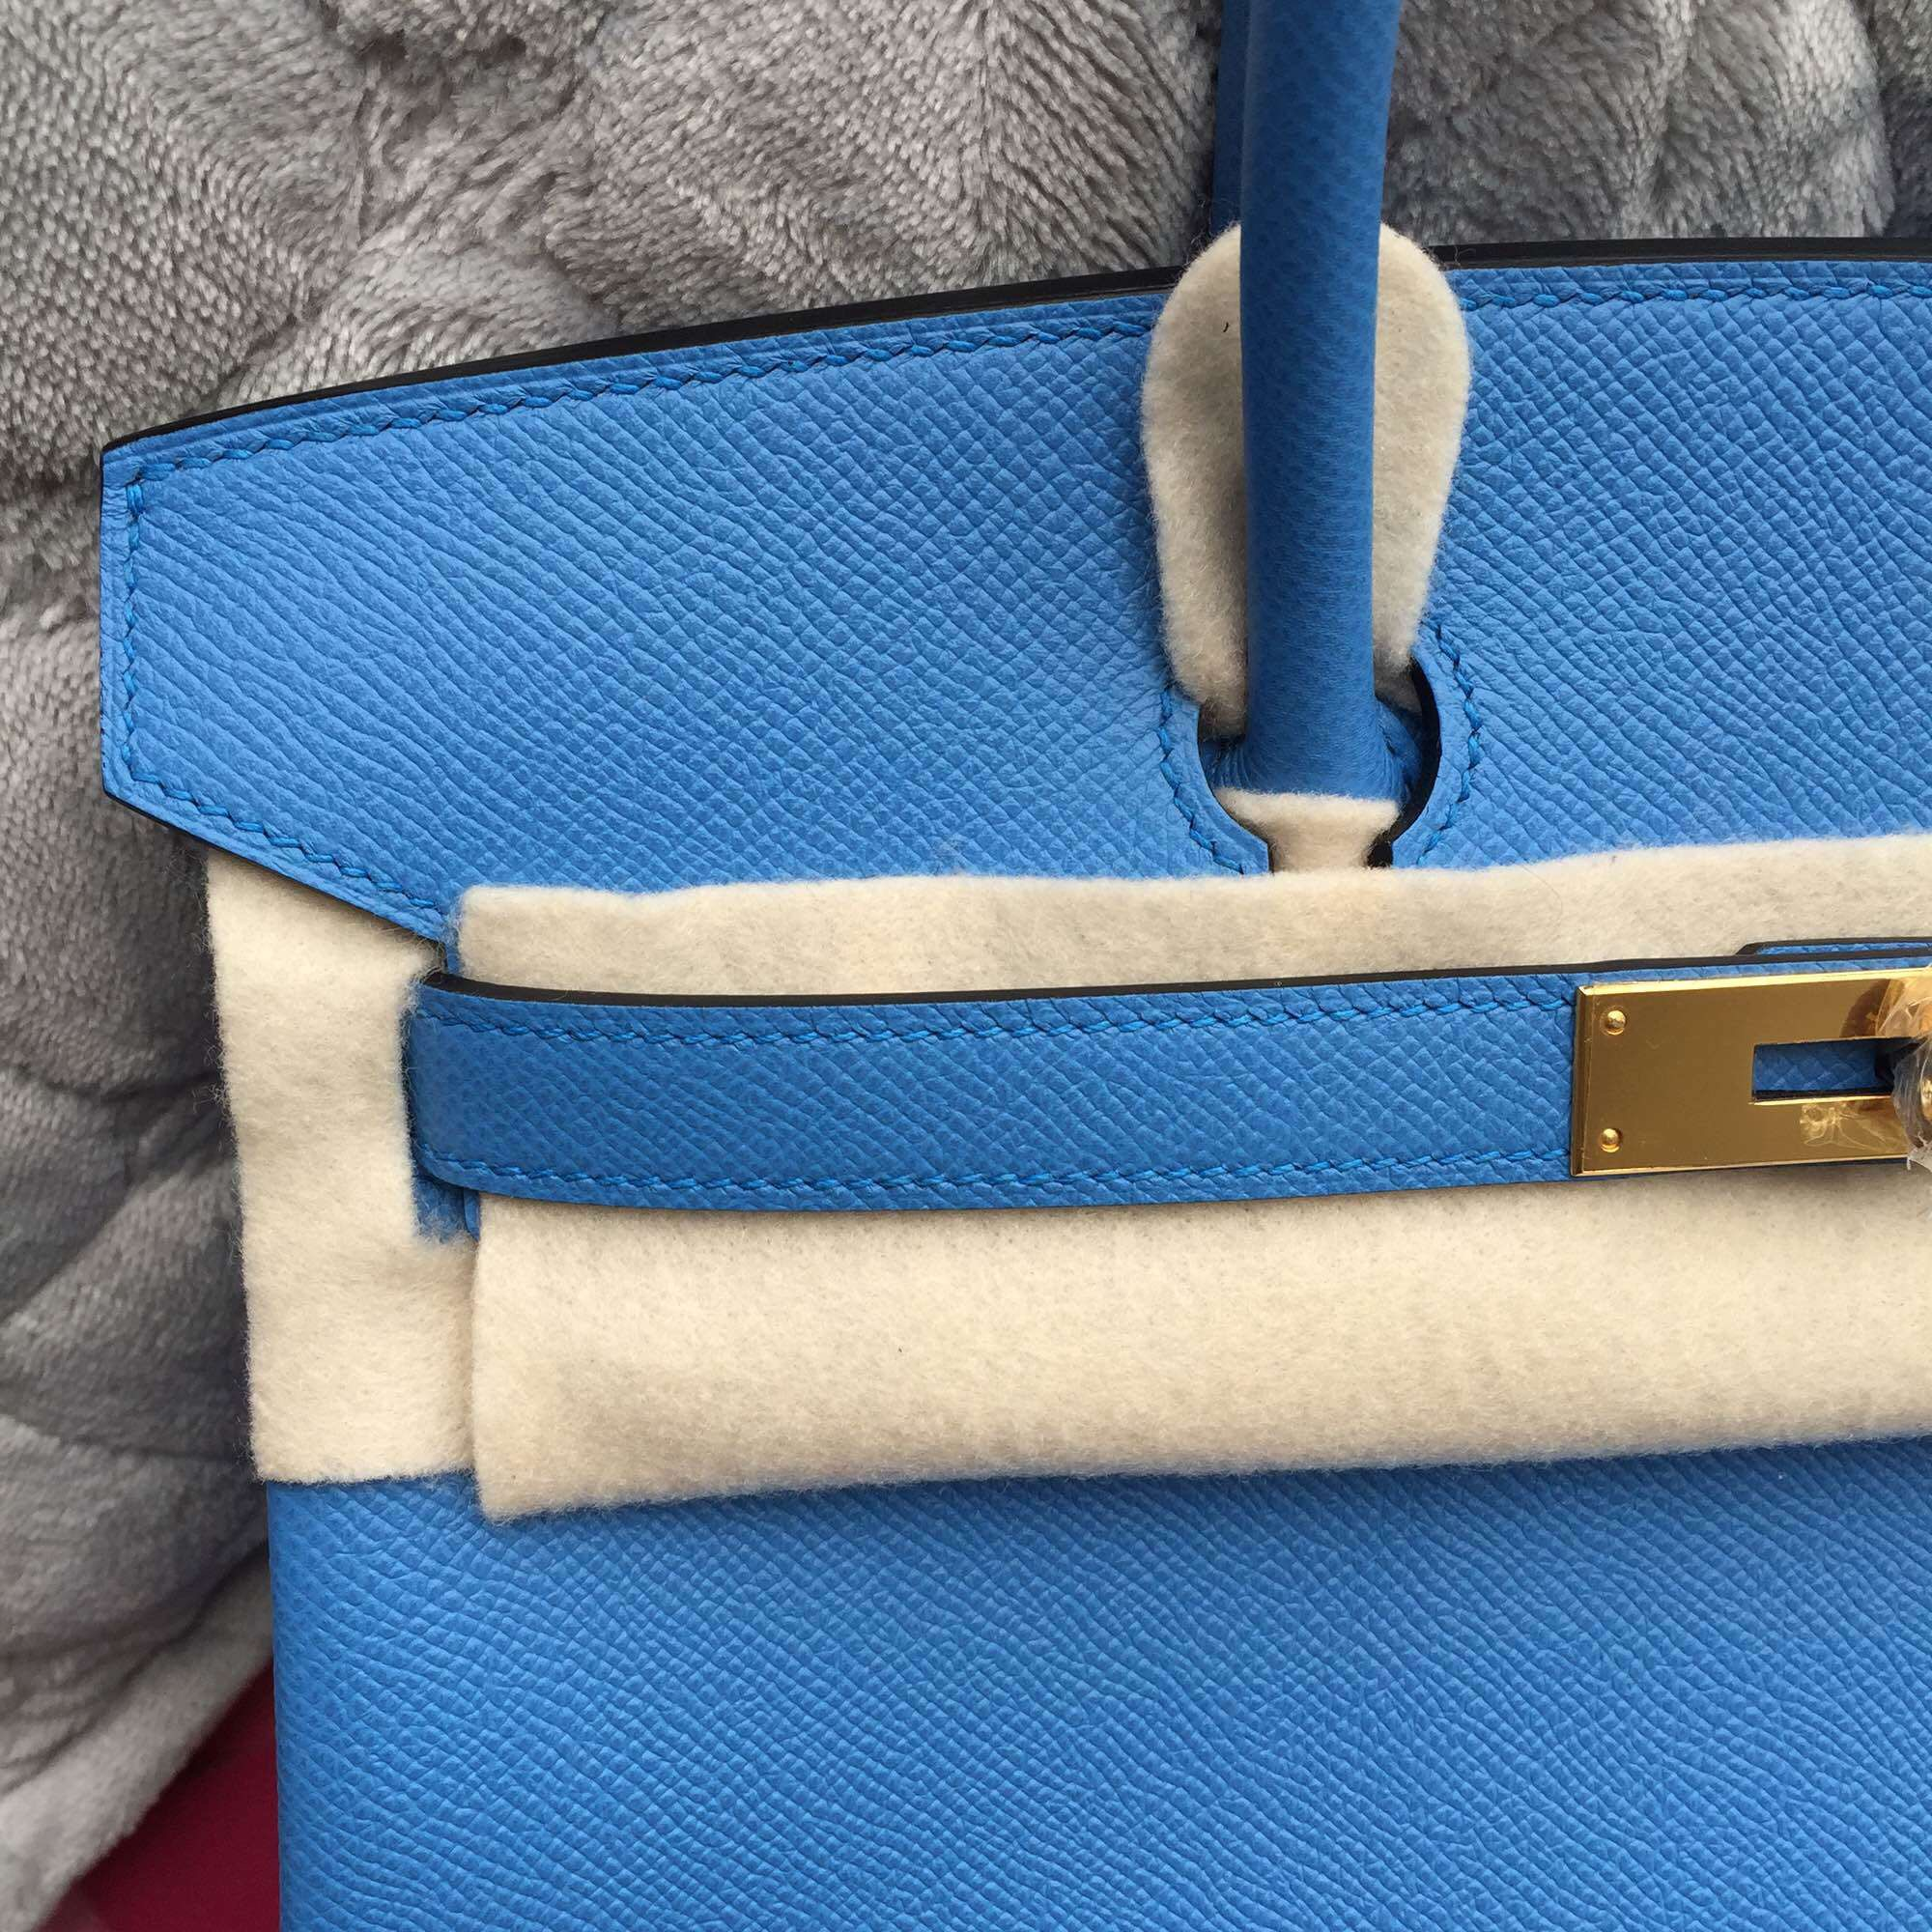 Hand Stitching 2T Blue Paradise Epsom Leather Hermes Birkin Bag 30CM Wholesale